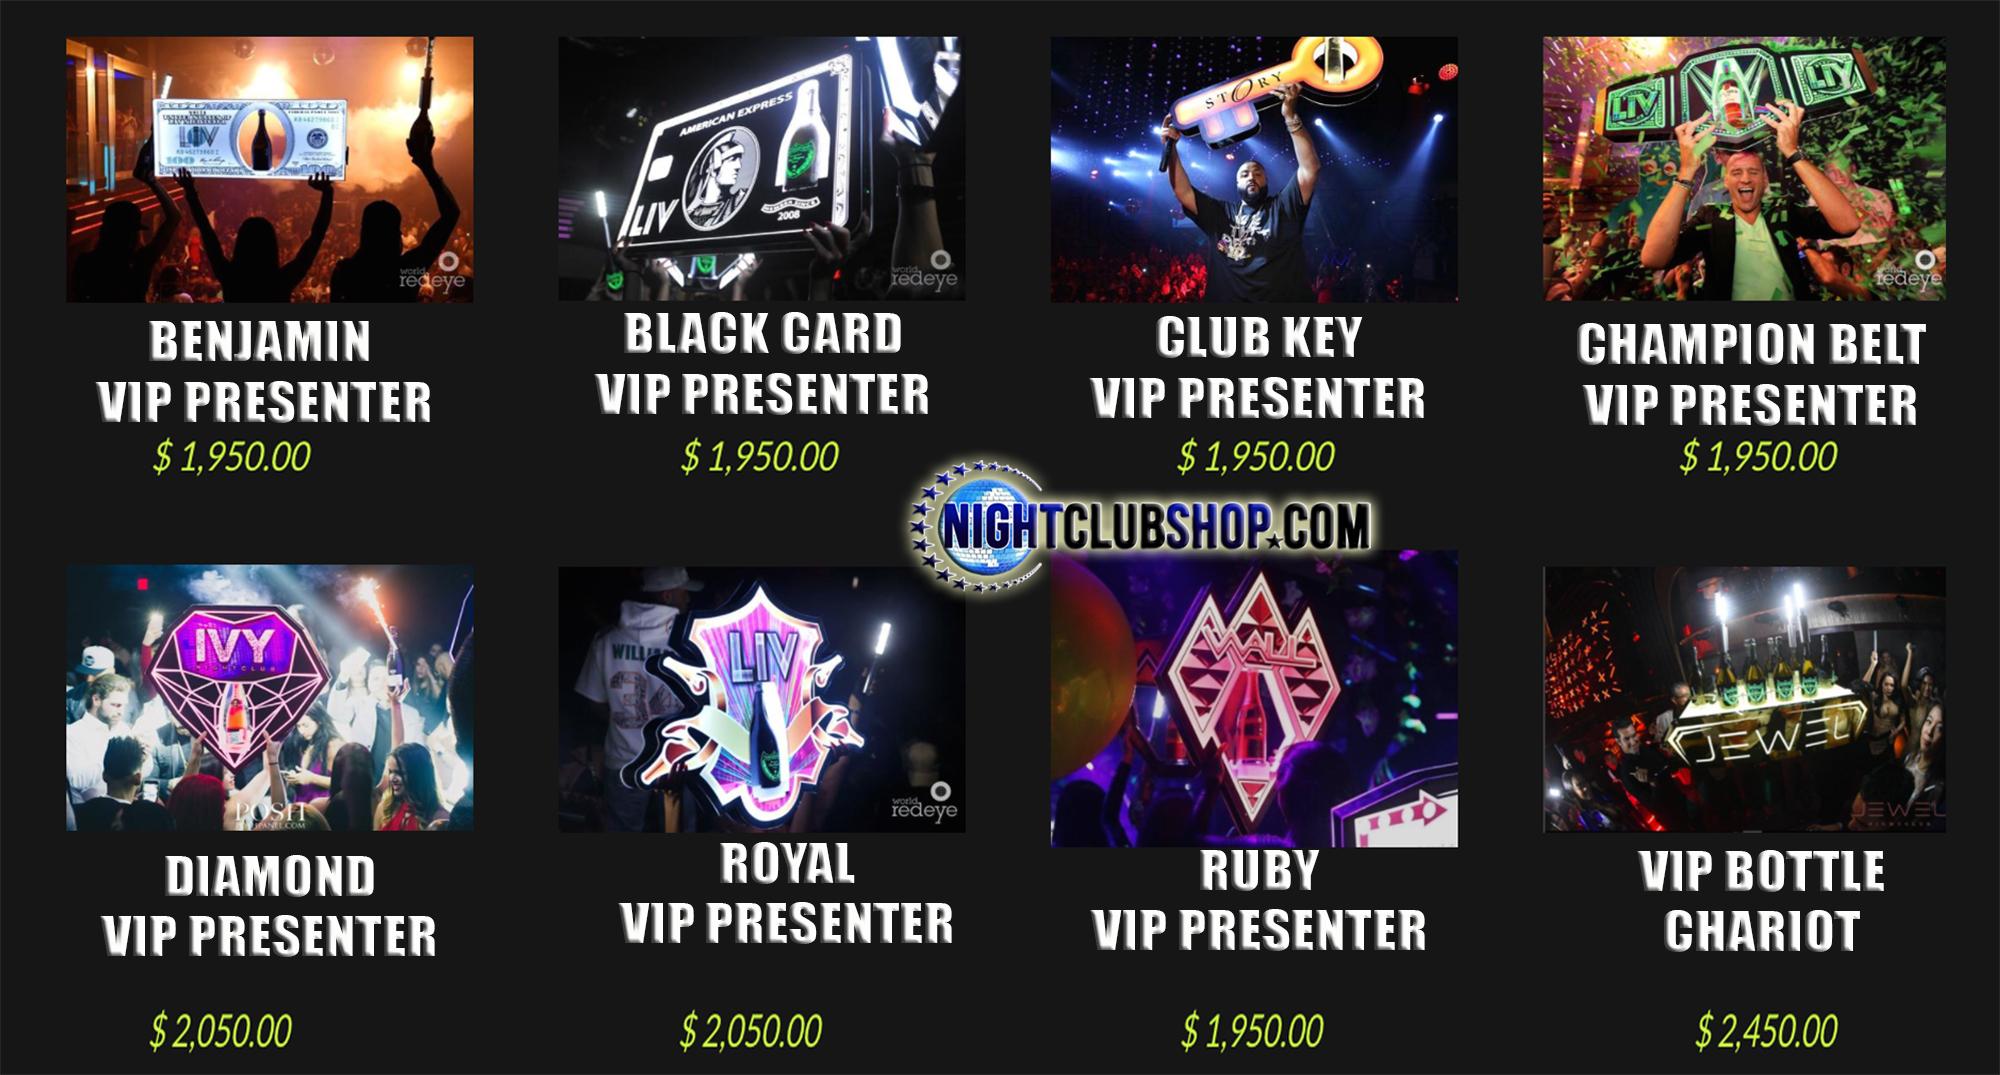 2-vip-monthly-program-nightclub-bar-dj-bottle-service-nightclubshop.jpg